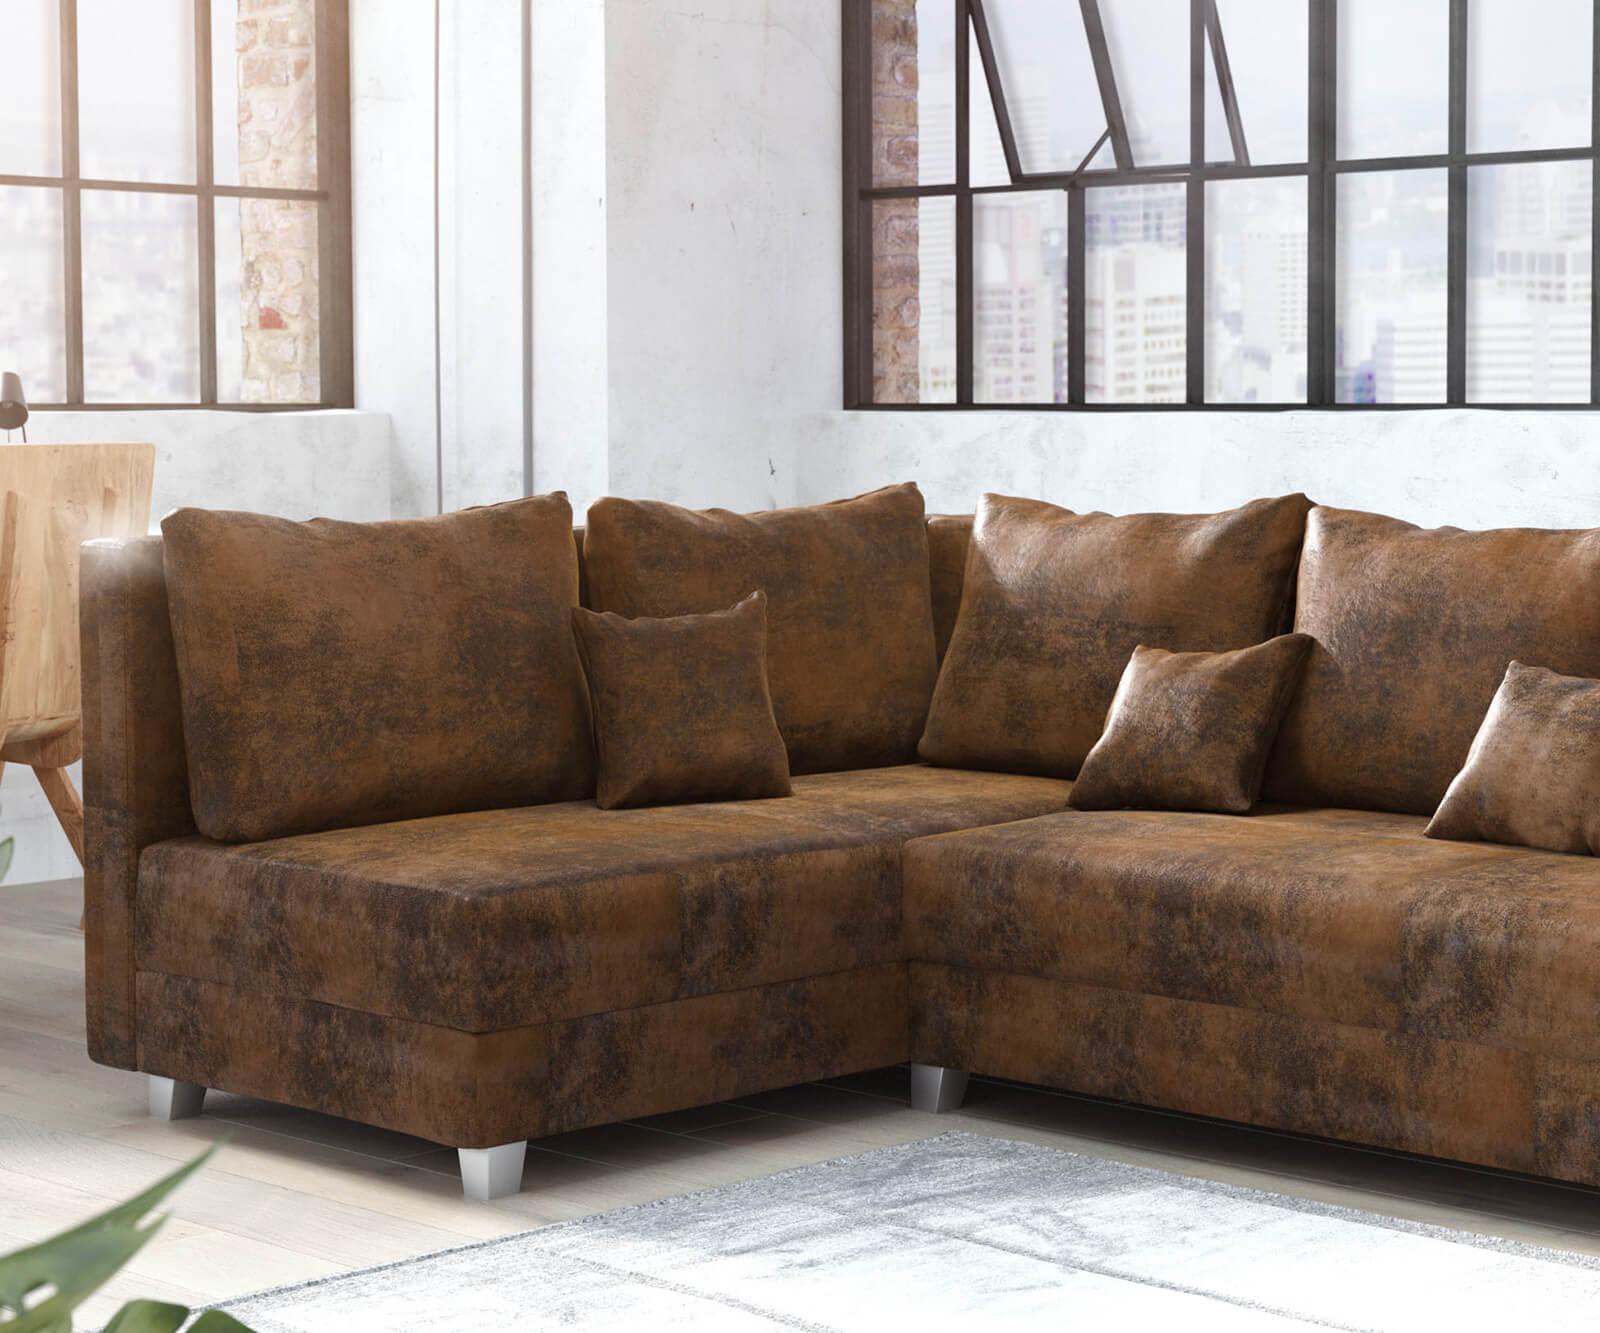 Ecksofa panama braun ottomane links modulsofa m bel sofas for Ecksofa ottomane